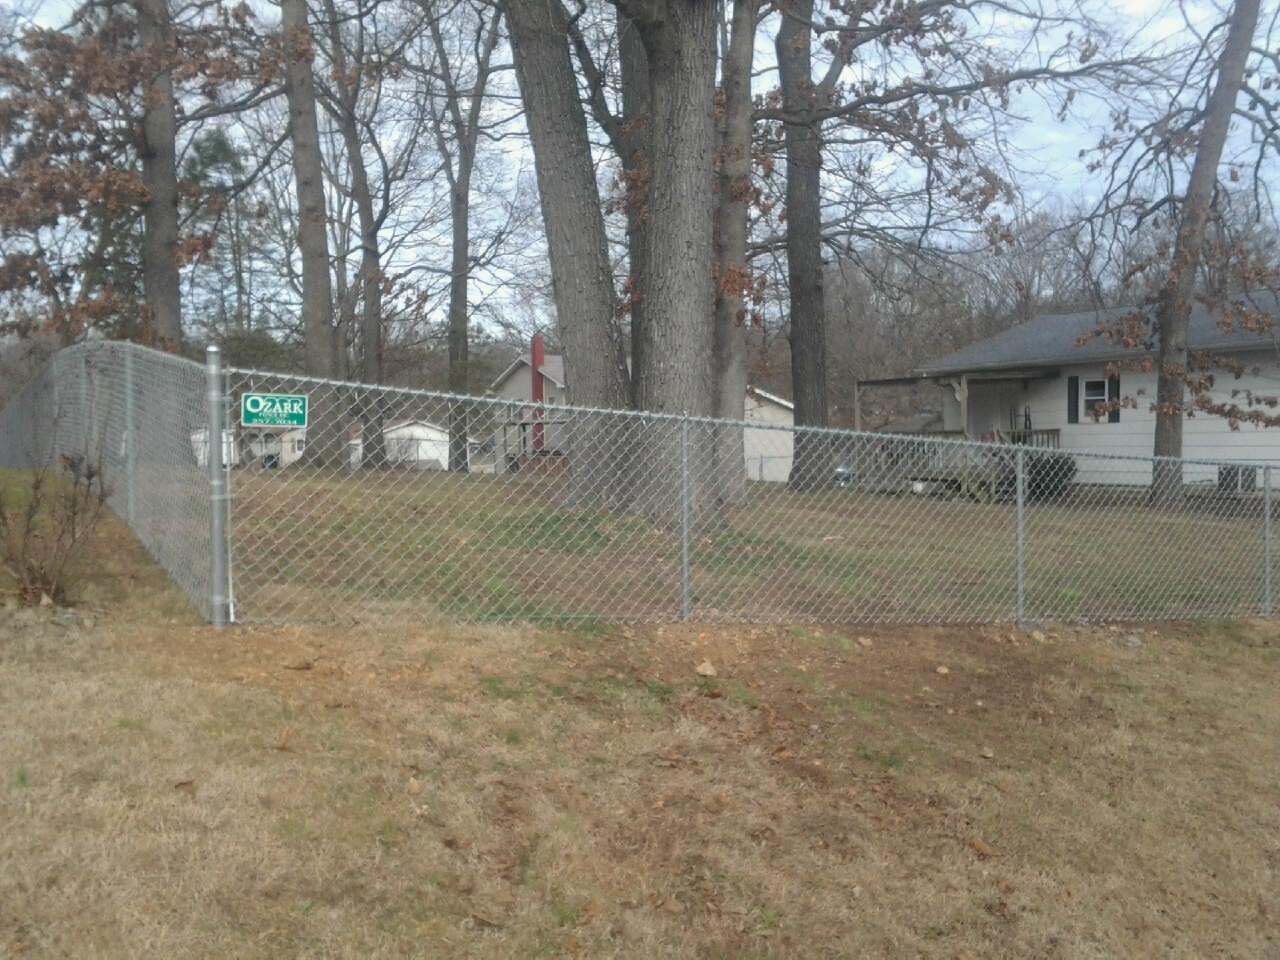 chain link fence installed by Ozark Fence, LLC